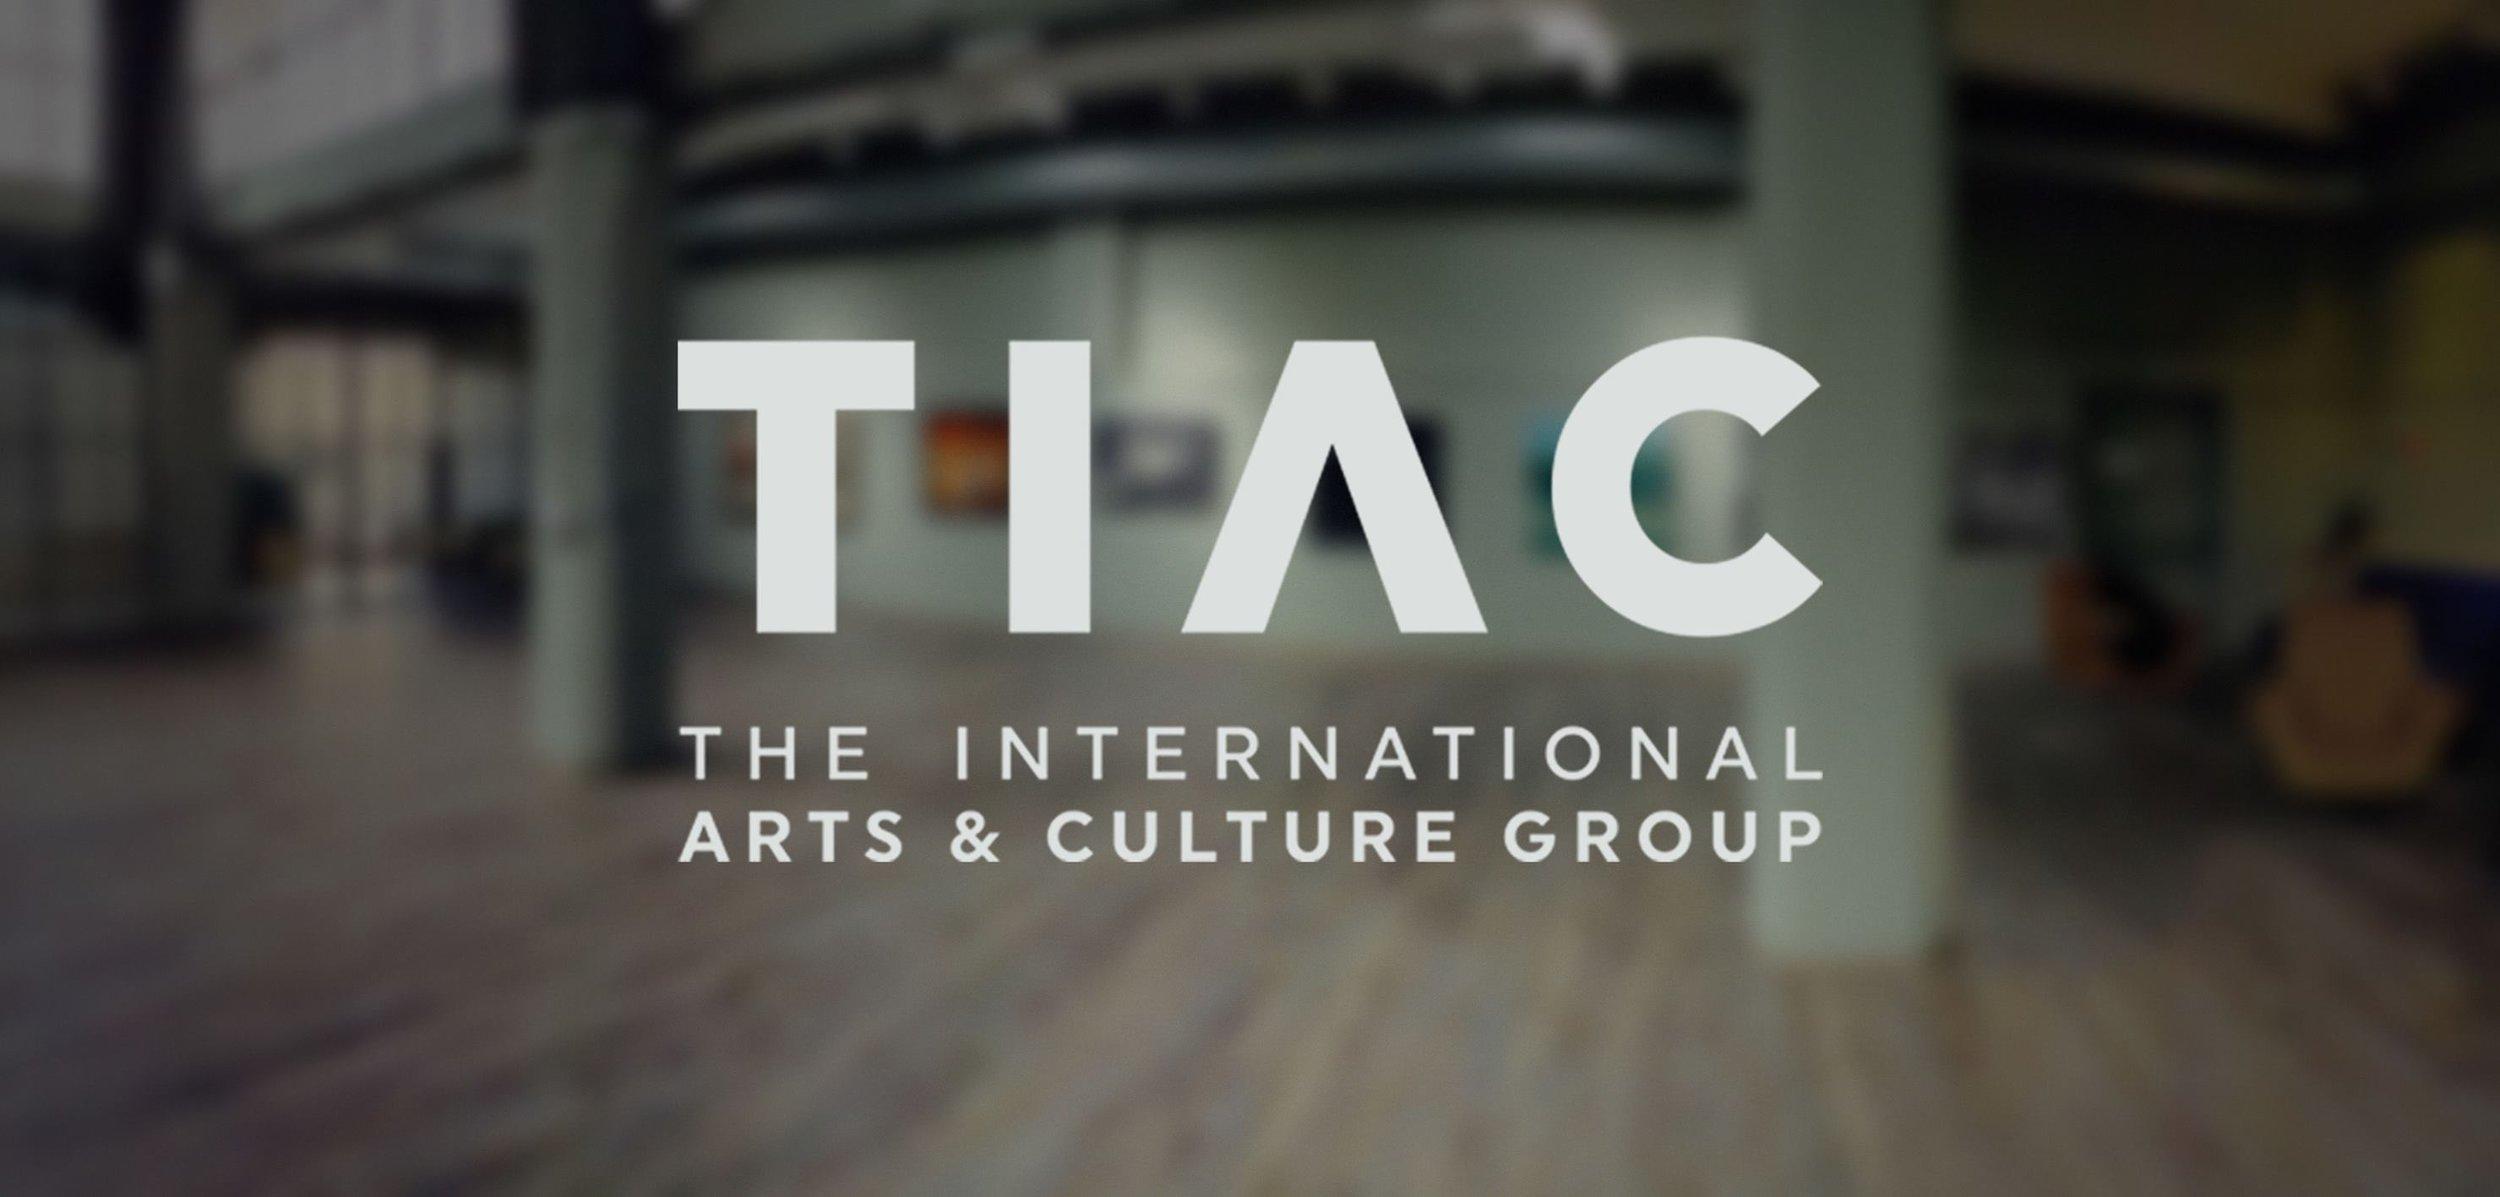 TIAC Banner Image.jpg